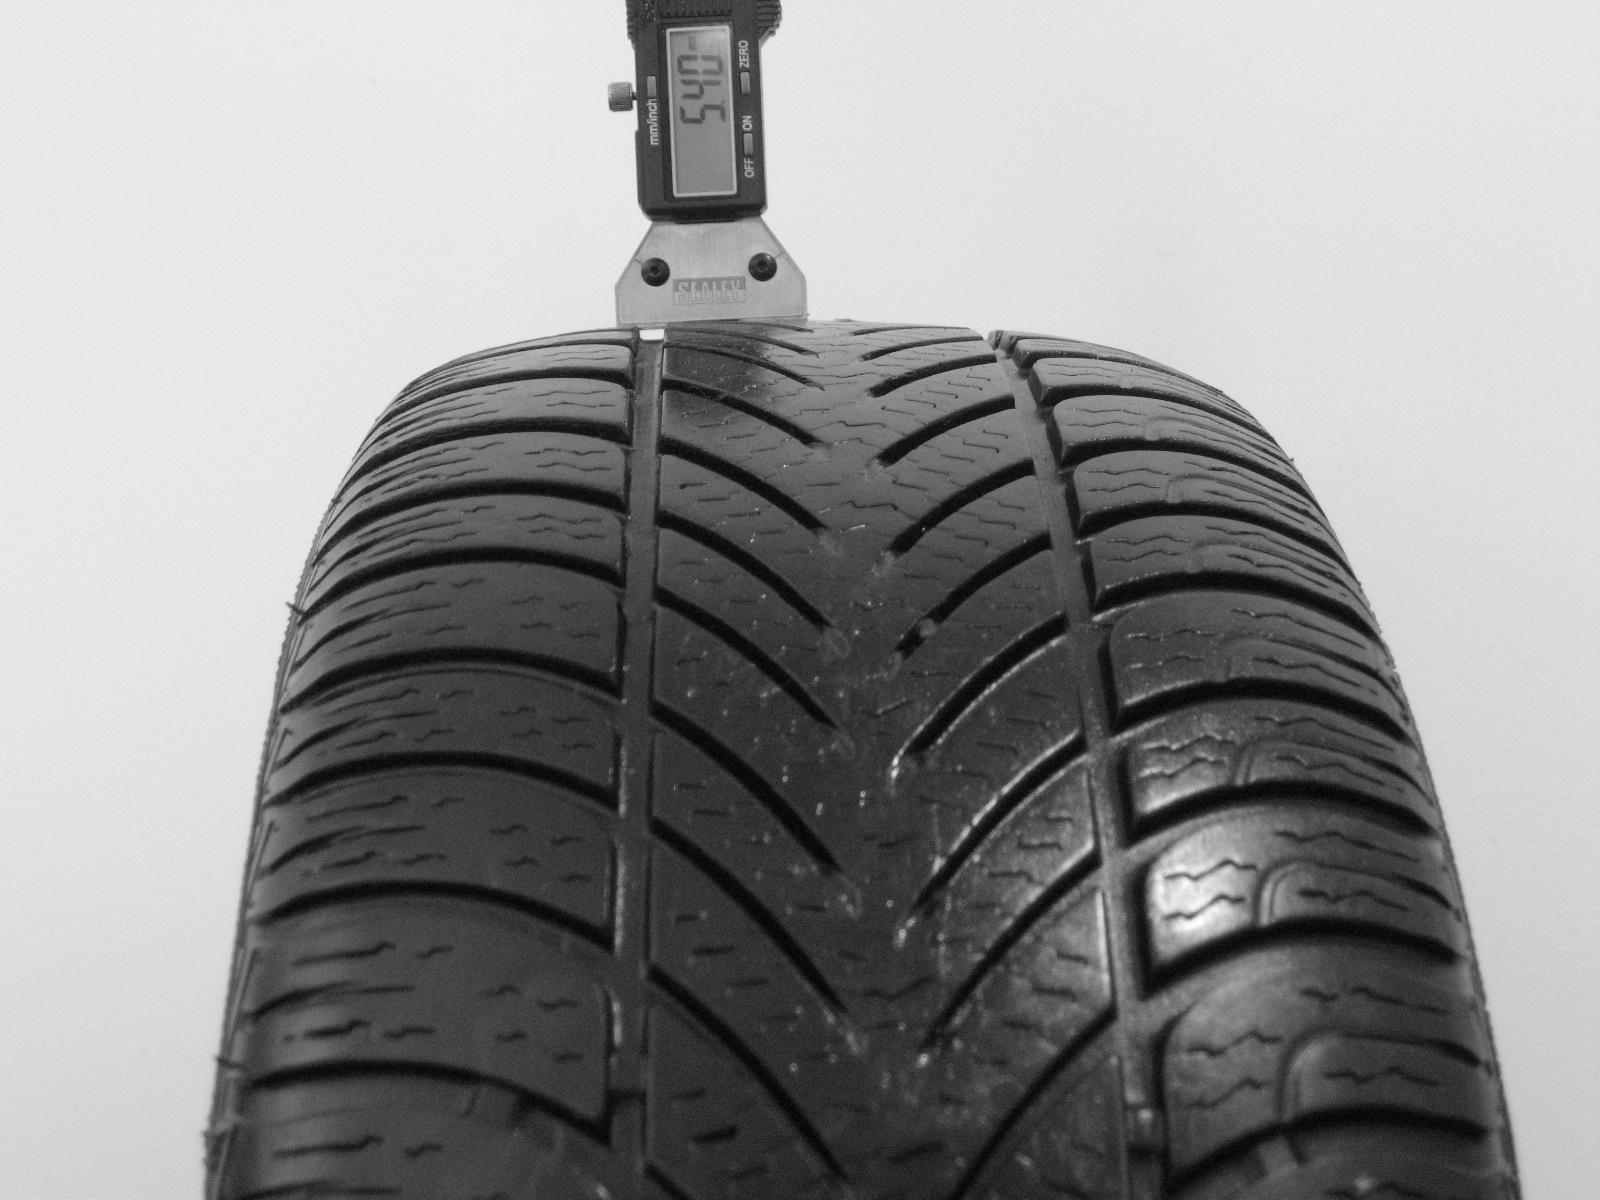 Použité-Pneu-Bazar - 205/55 R16 FULDA KRISTALL SUPREMO -kusovka-rezerva 3mm